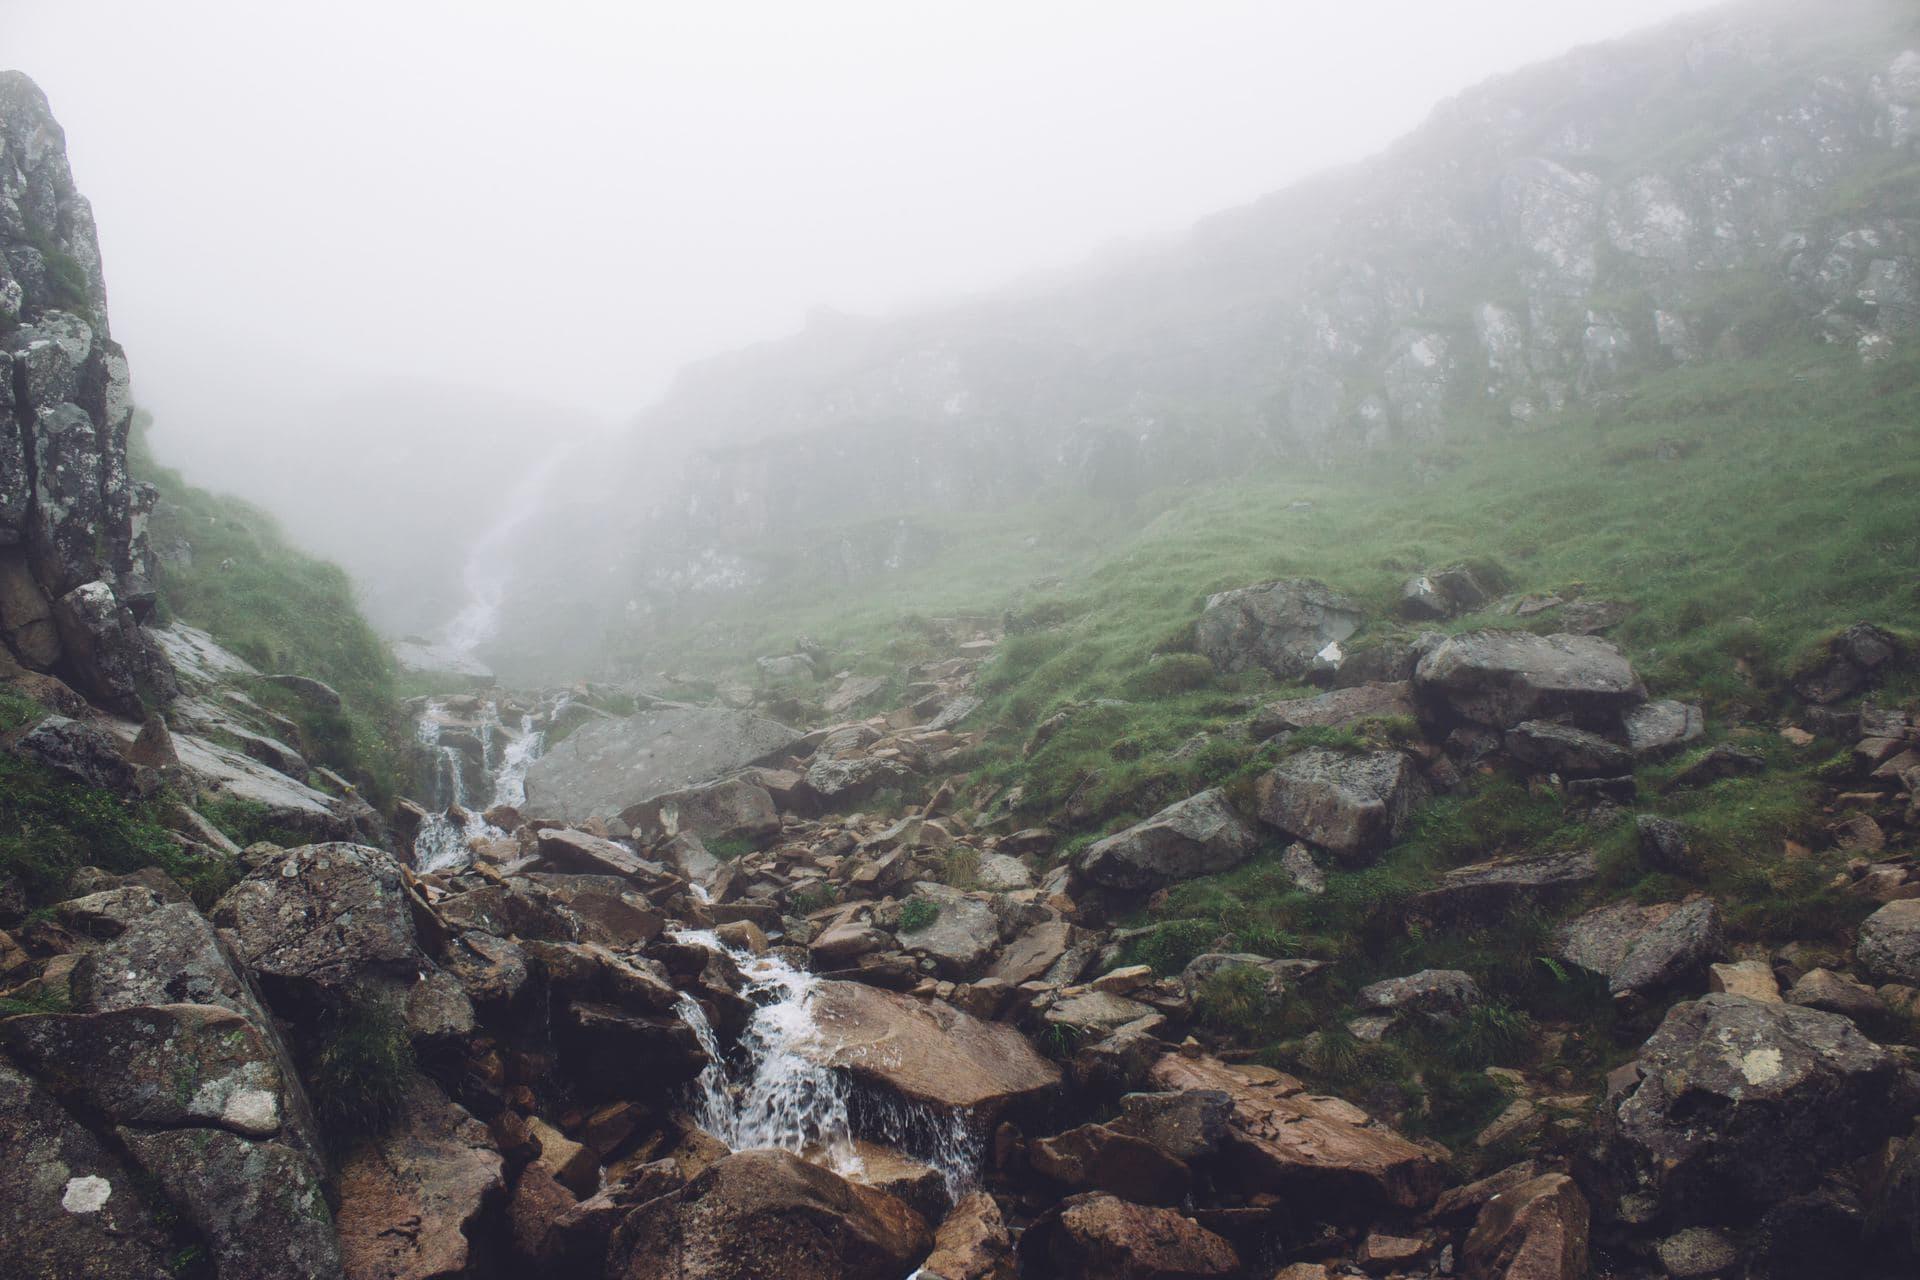 Cape Wrath Ultramarathon West Coast of Scotland